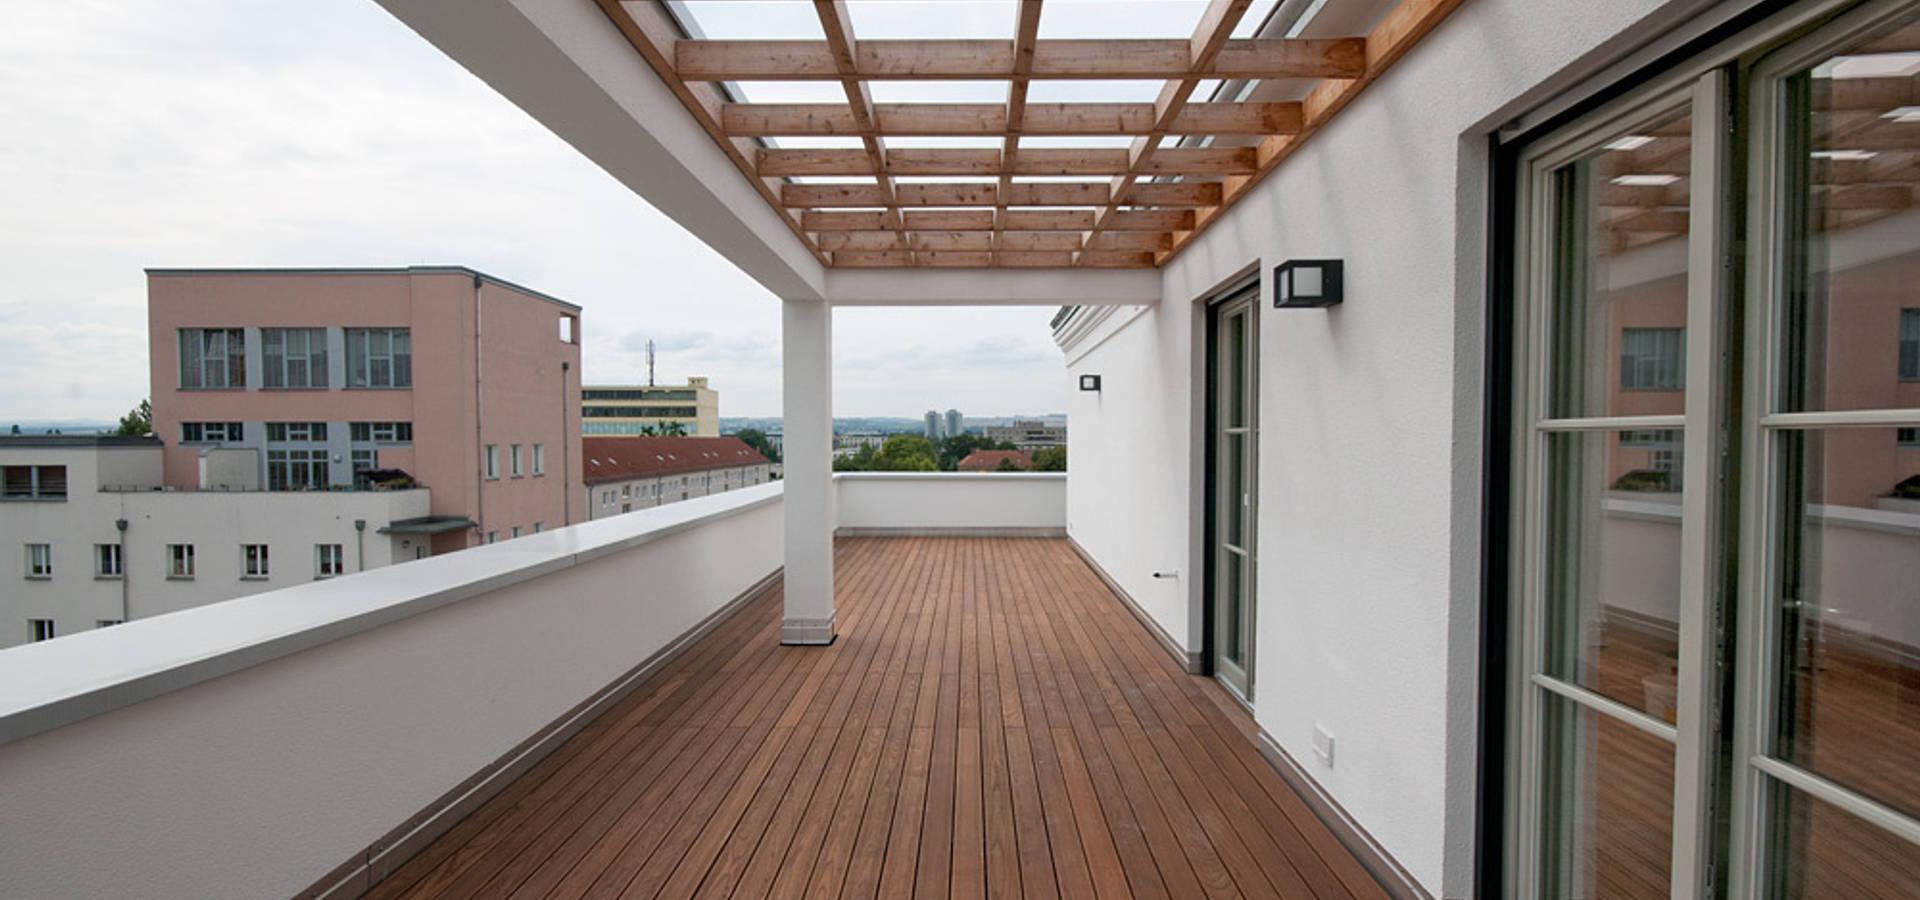 Seidel+Architekten